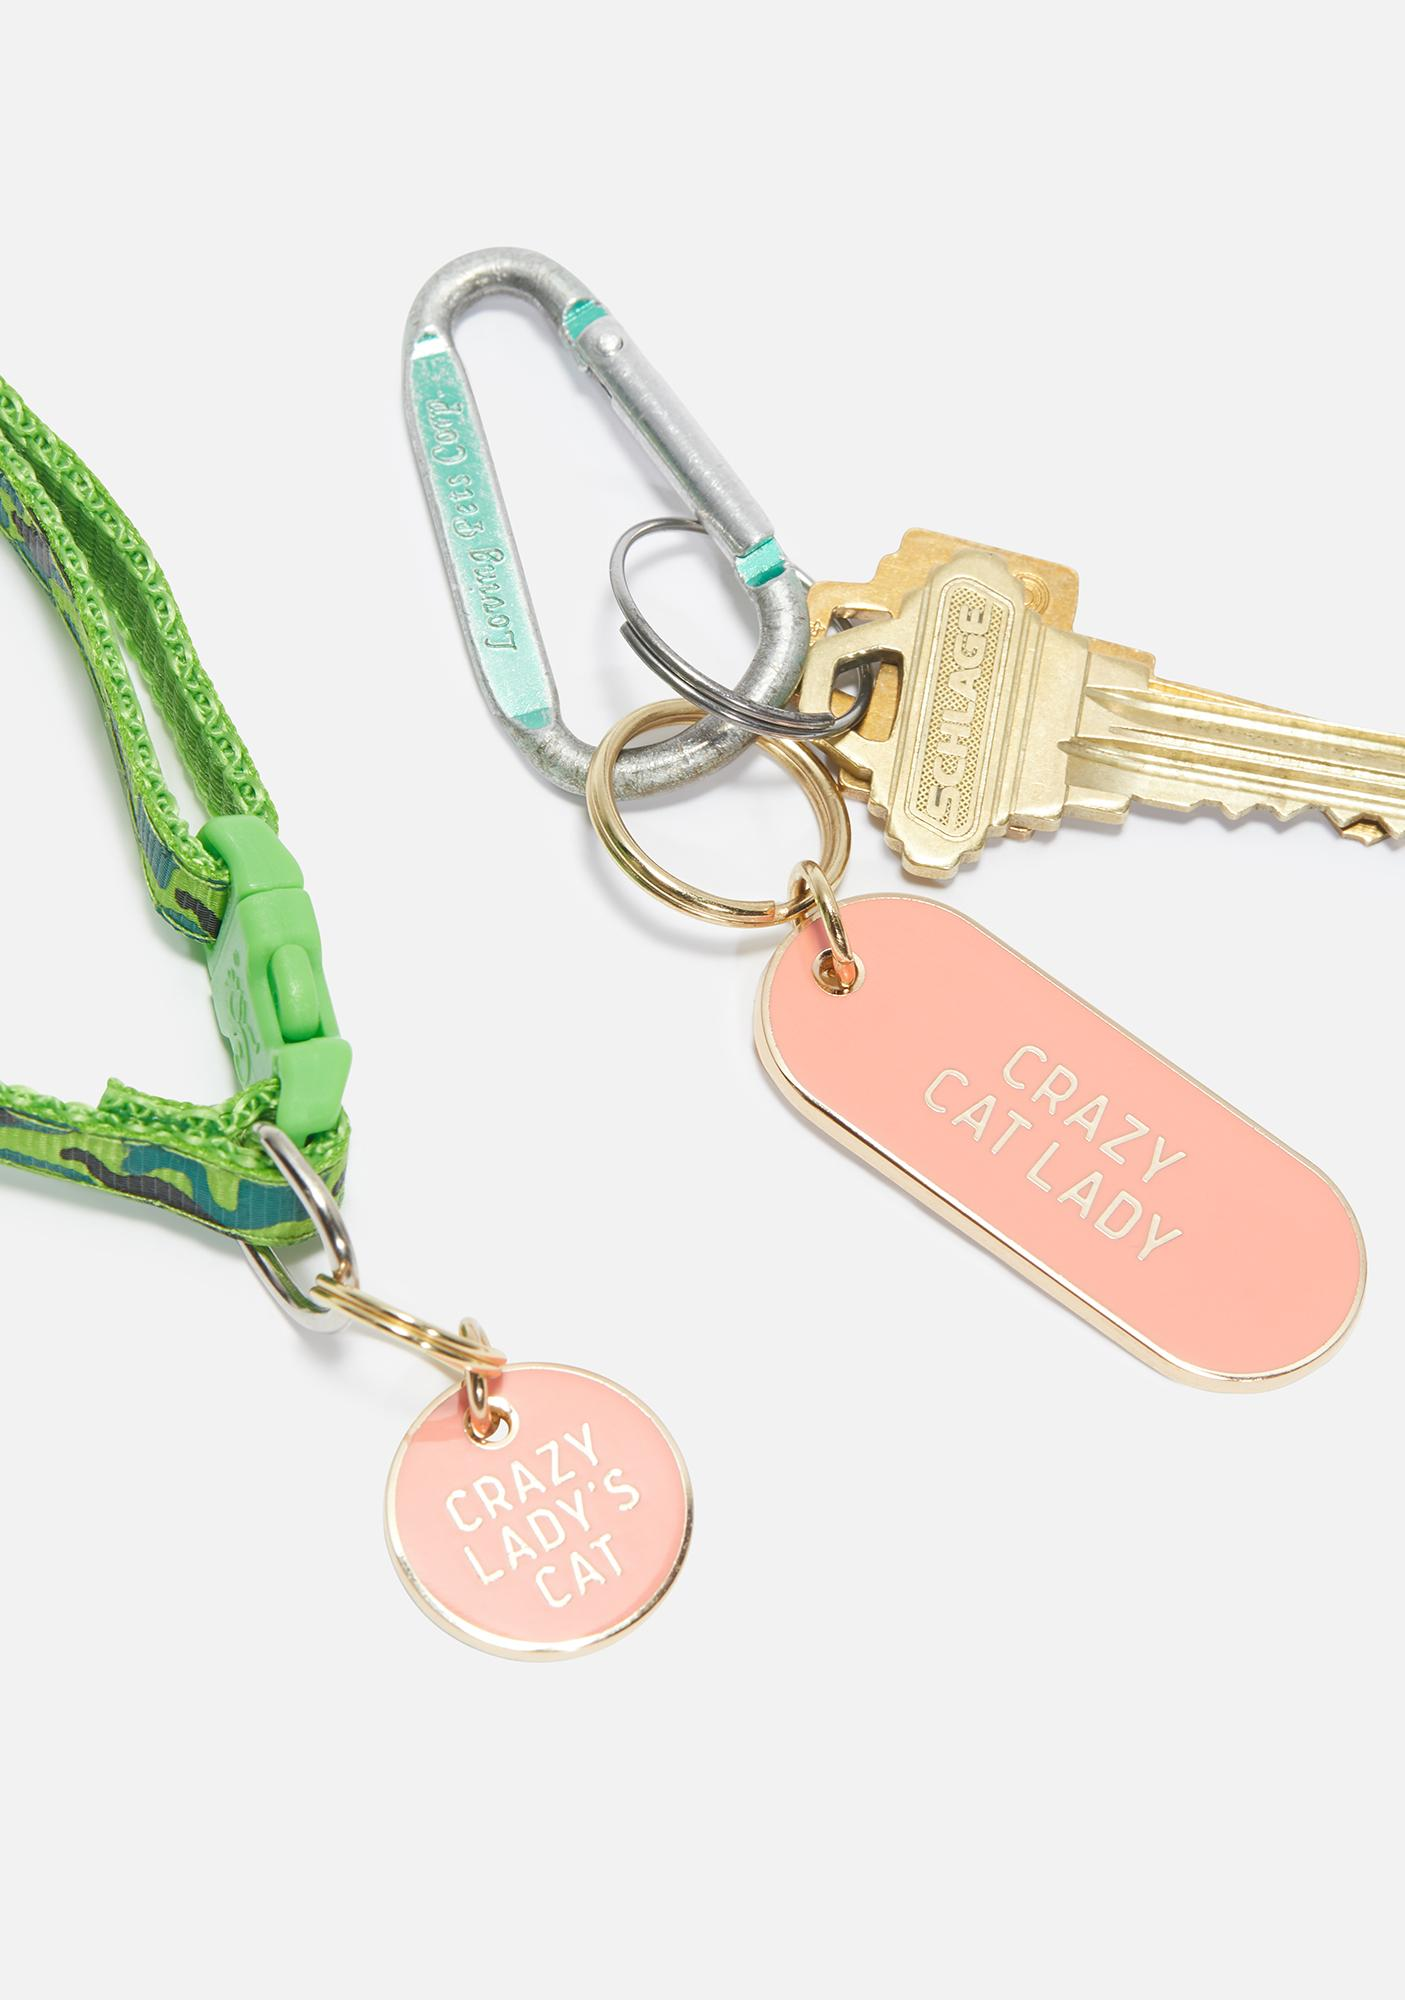 Crazy Cat Lady Tag & Key Chain